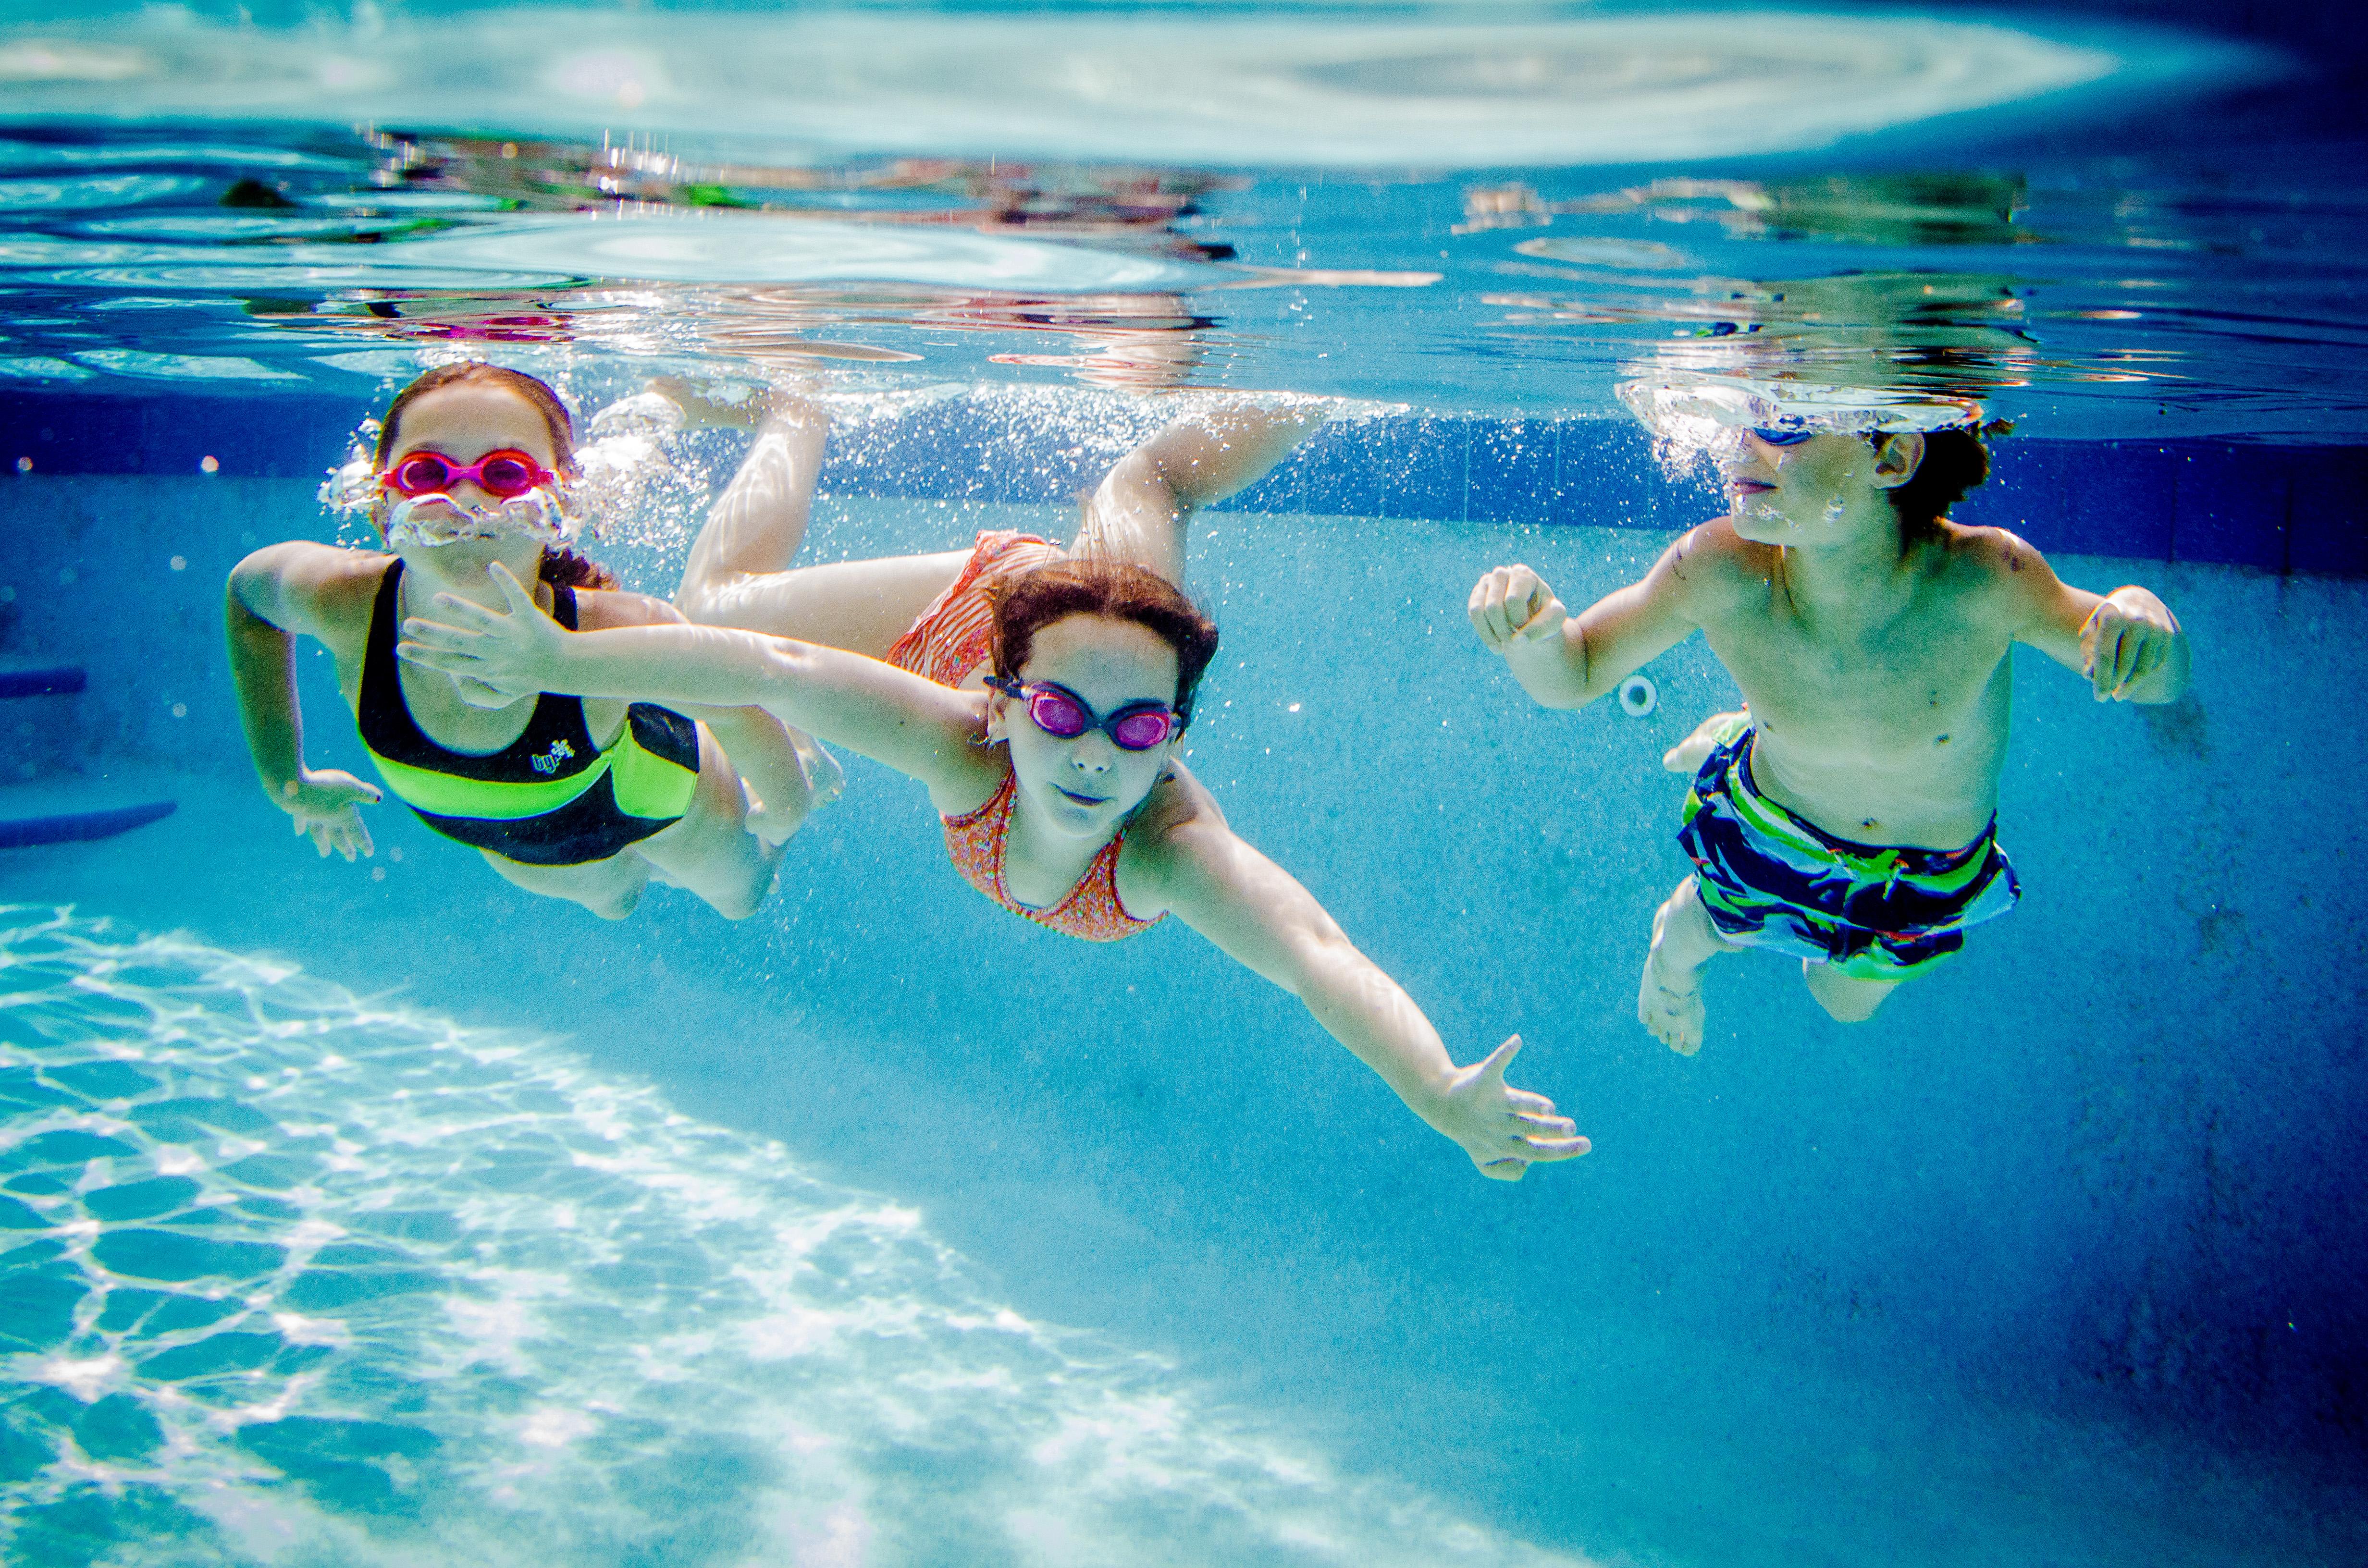 Grafton swim team has strong showing at Shorewood invitational